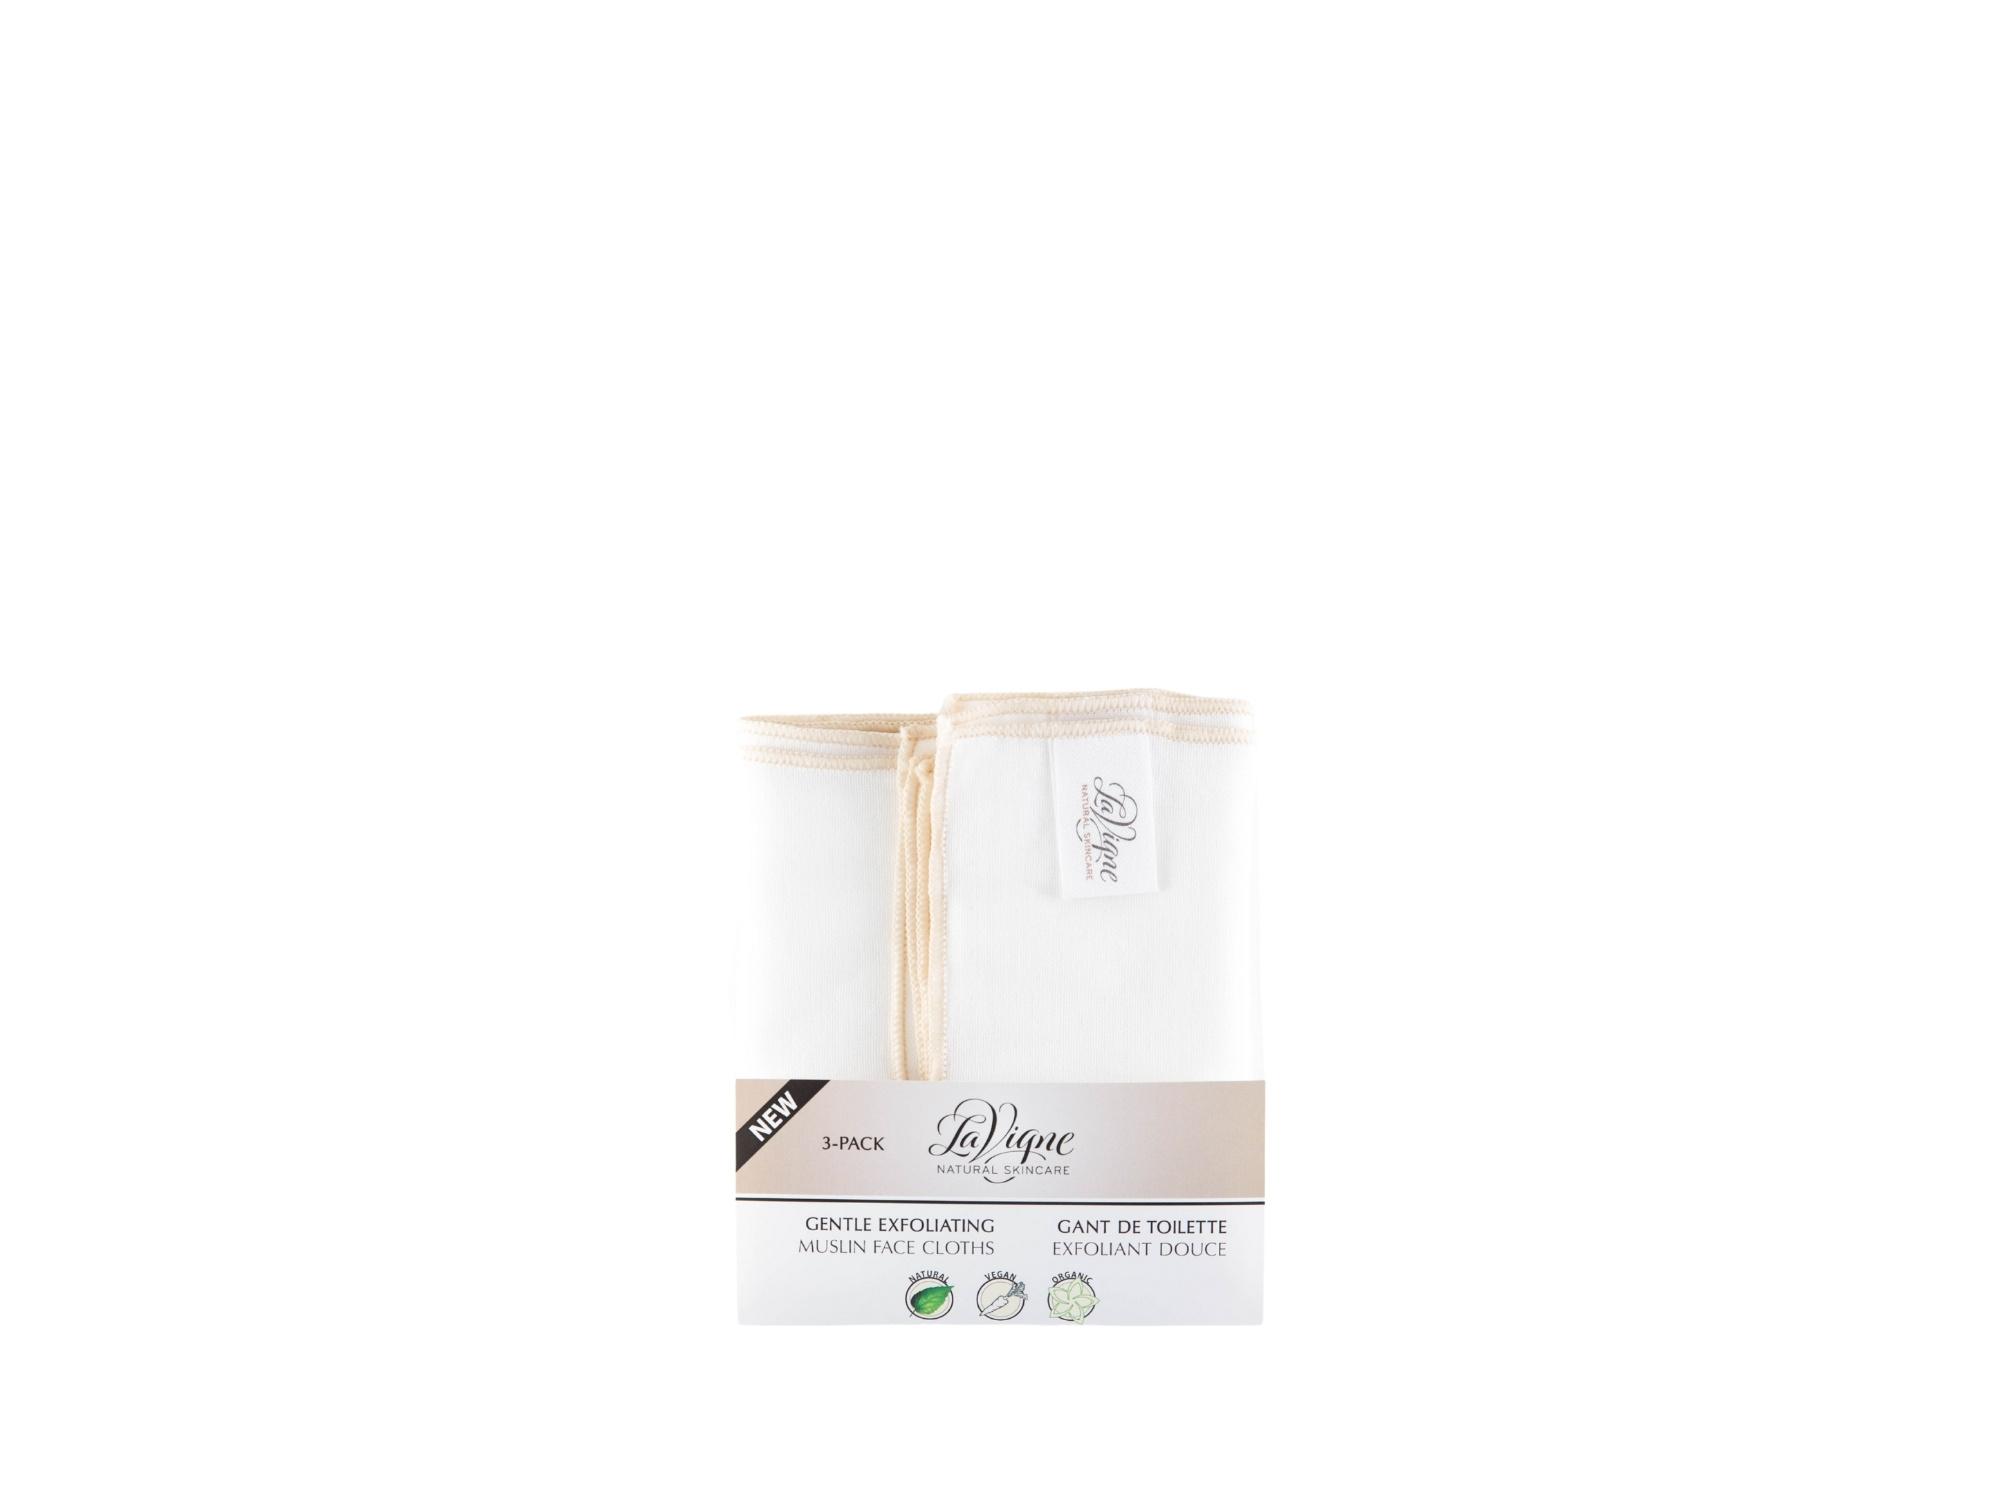 Lavigne Organics Gentle Exfoliating Muslin Face Cloth - pk/3